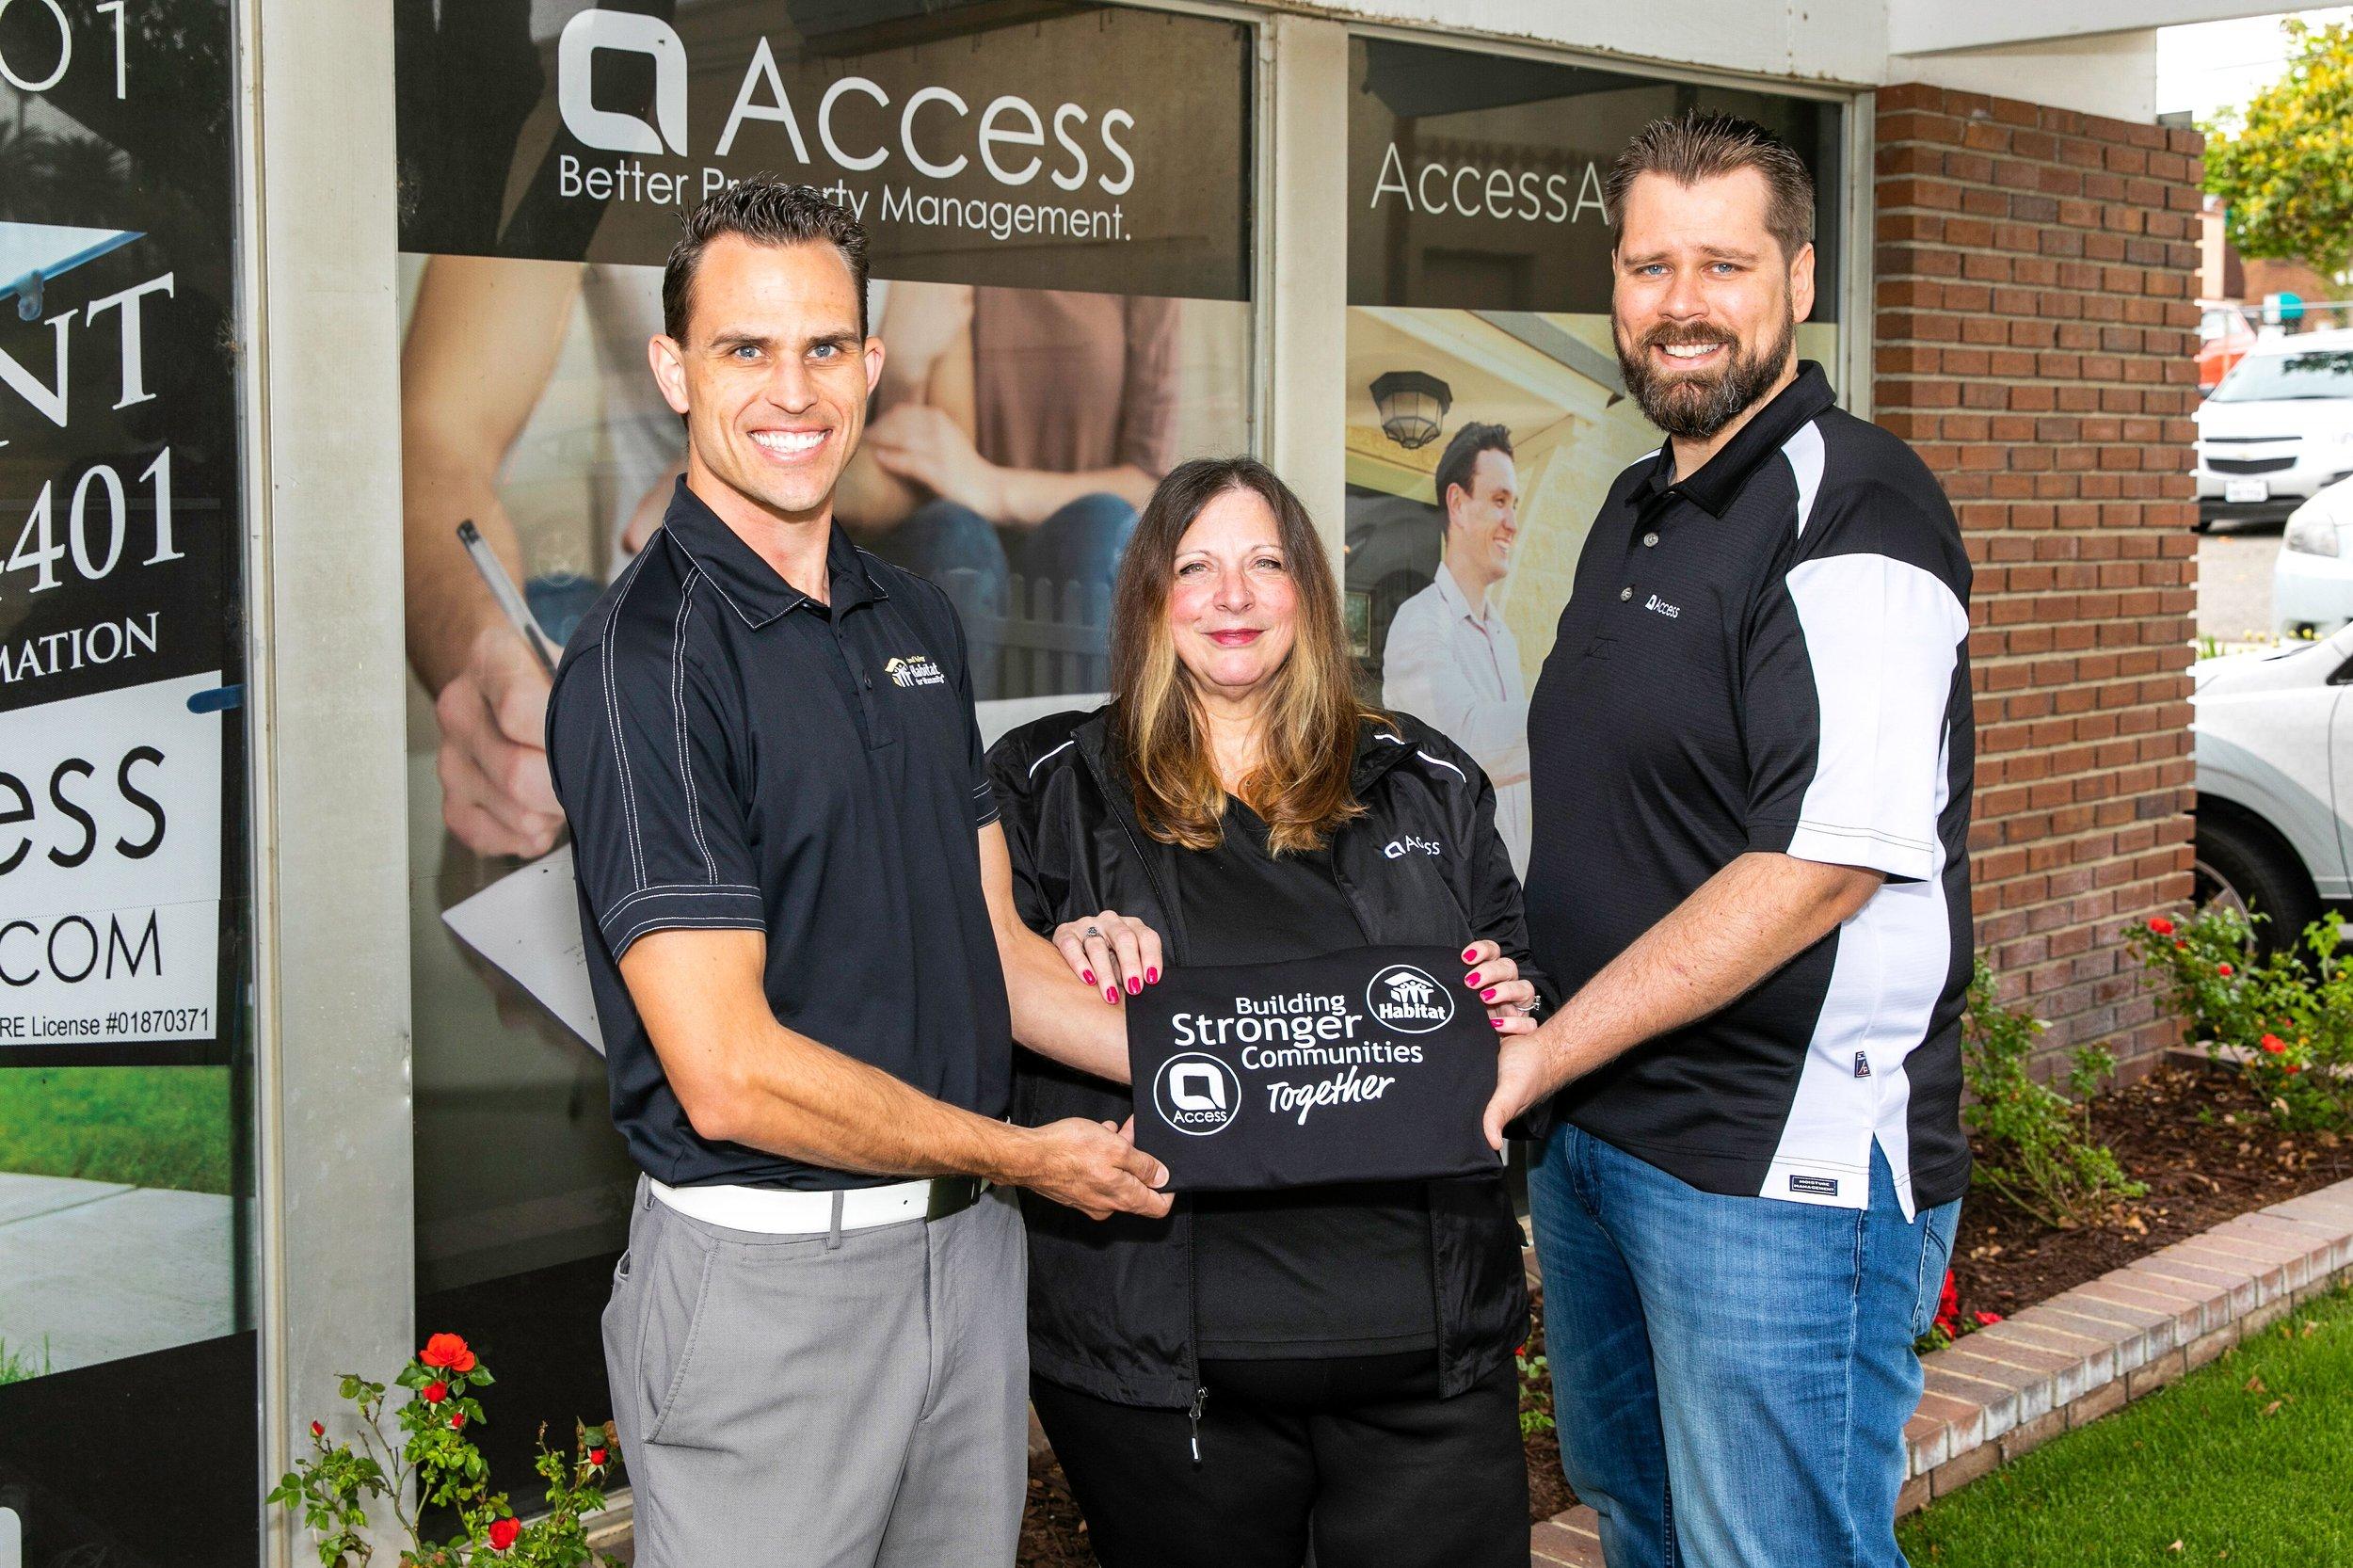 Access Management photo 3.JPG